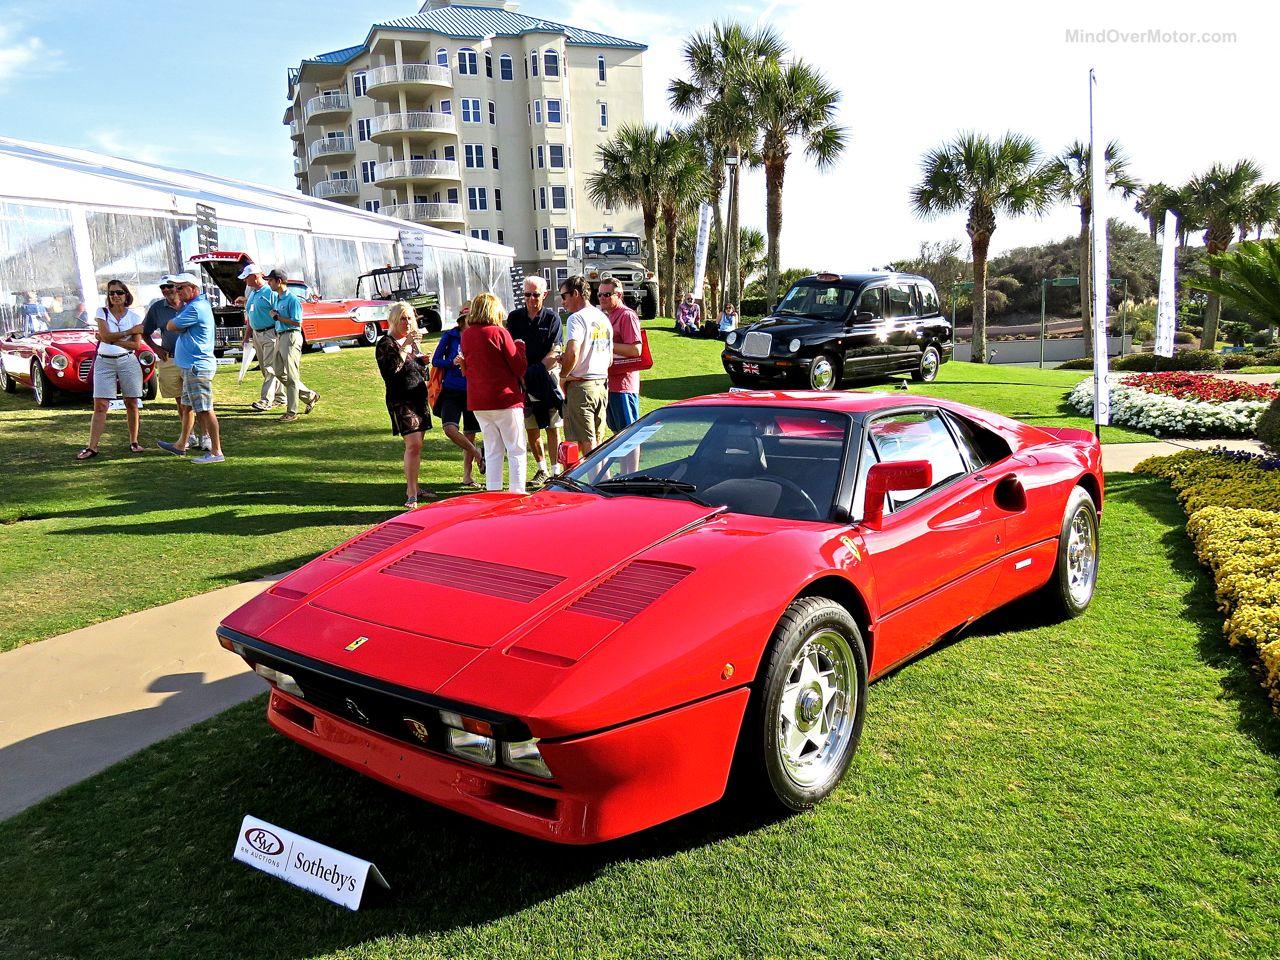 Ferrari 288 GTO RM Sotheby's Amelia Island 1